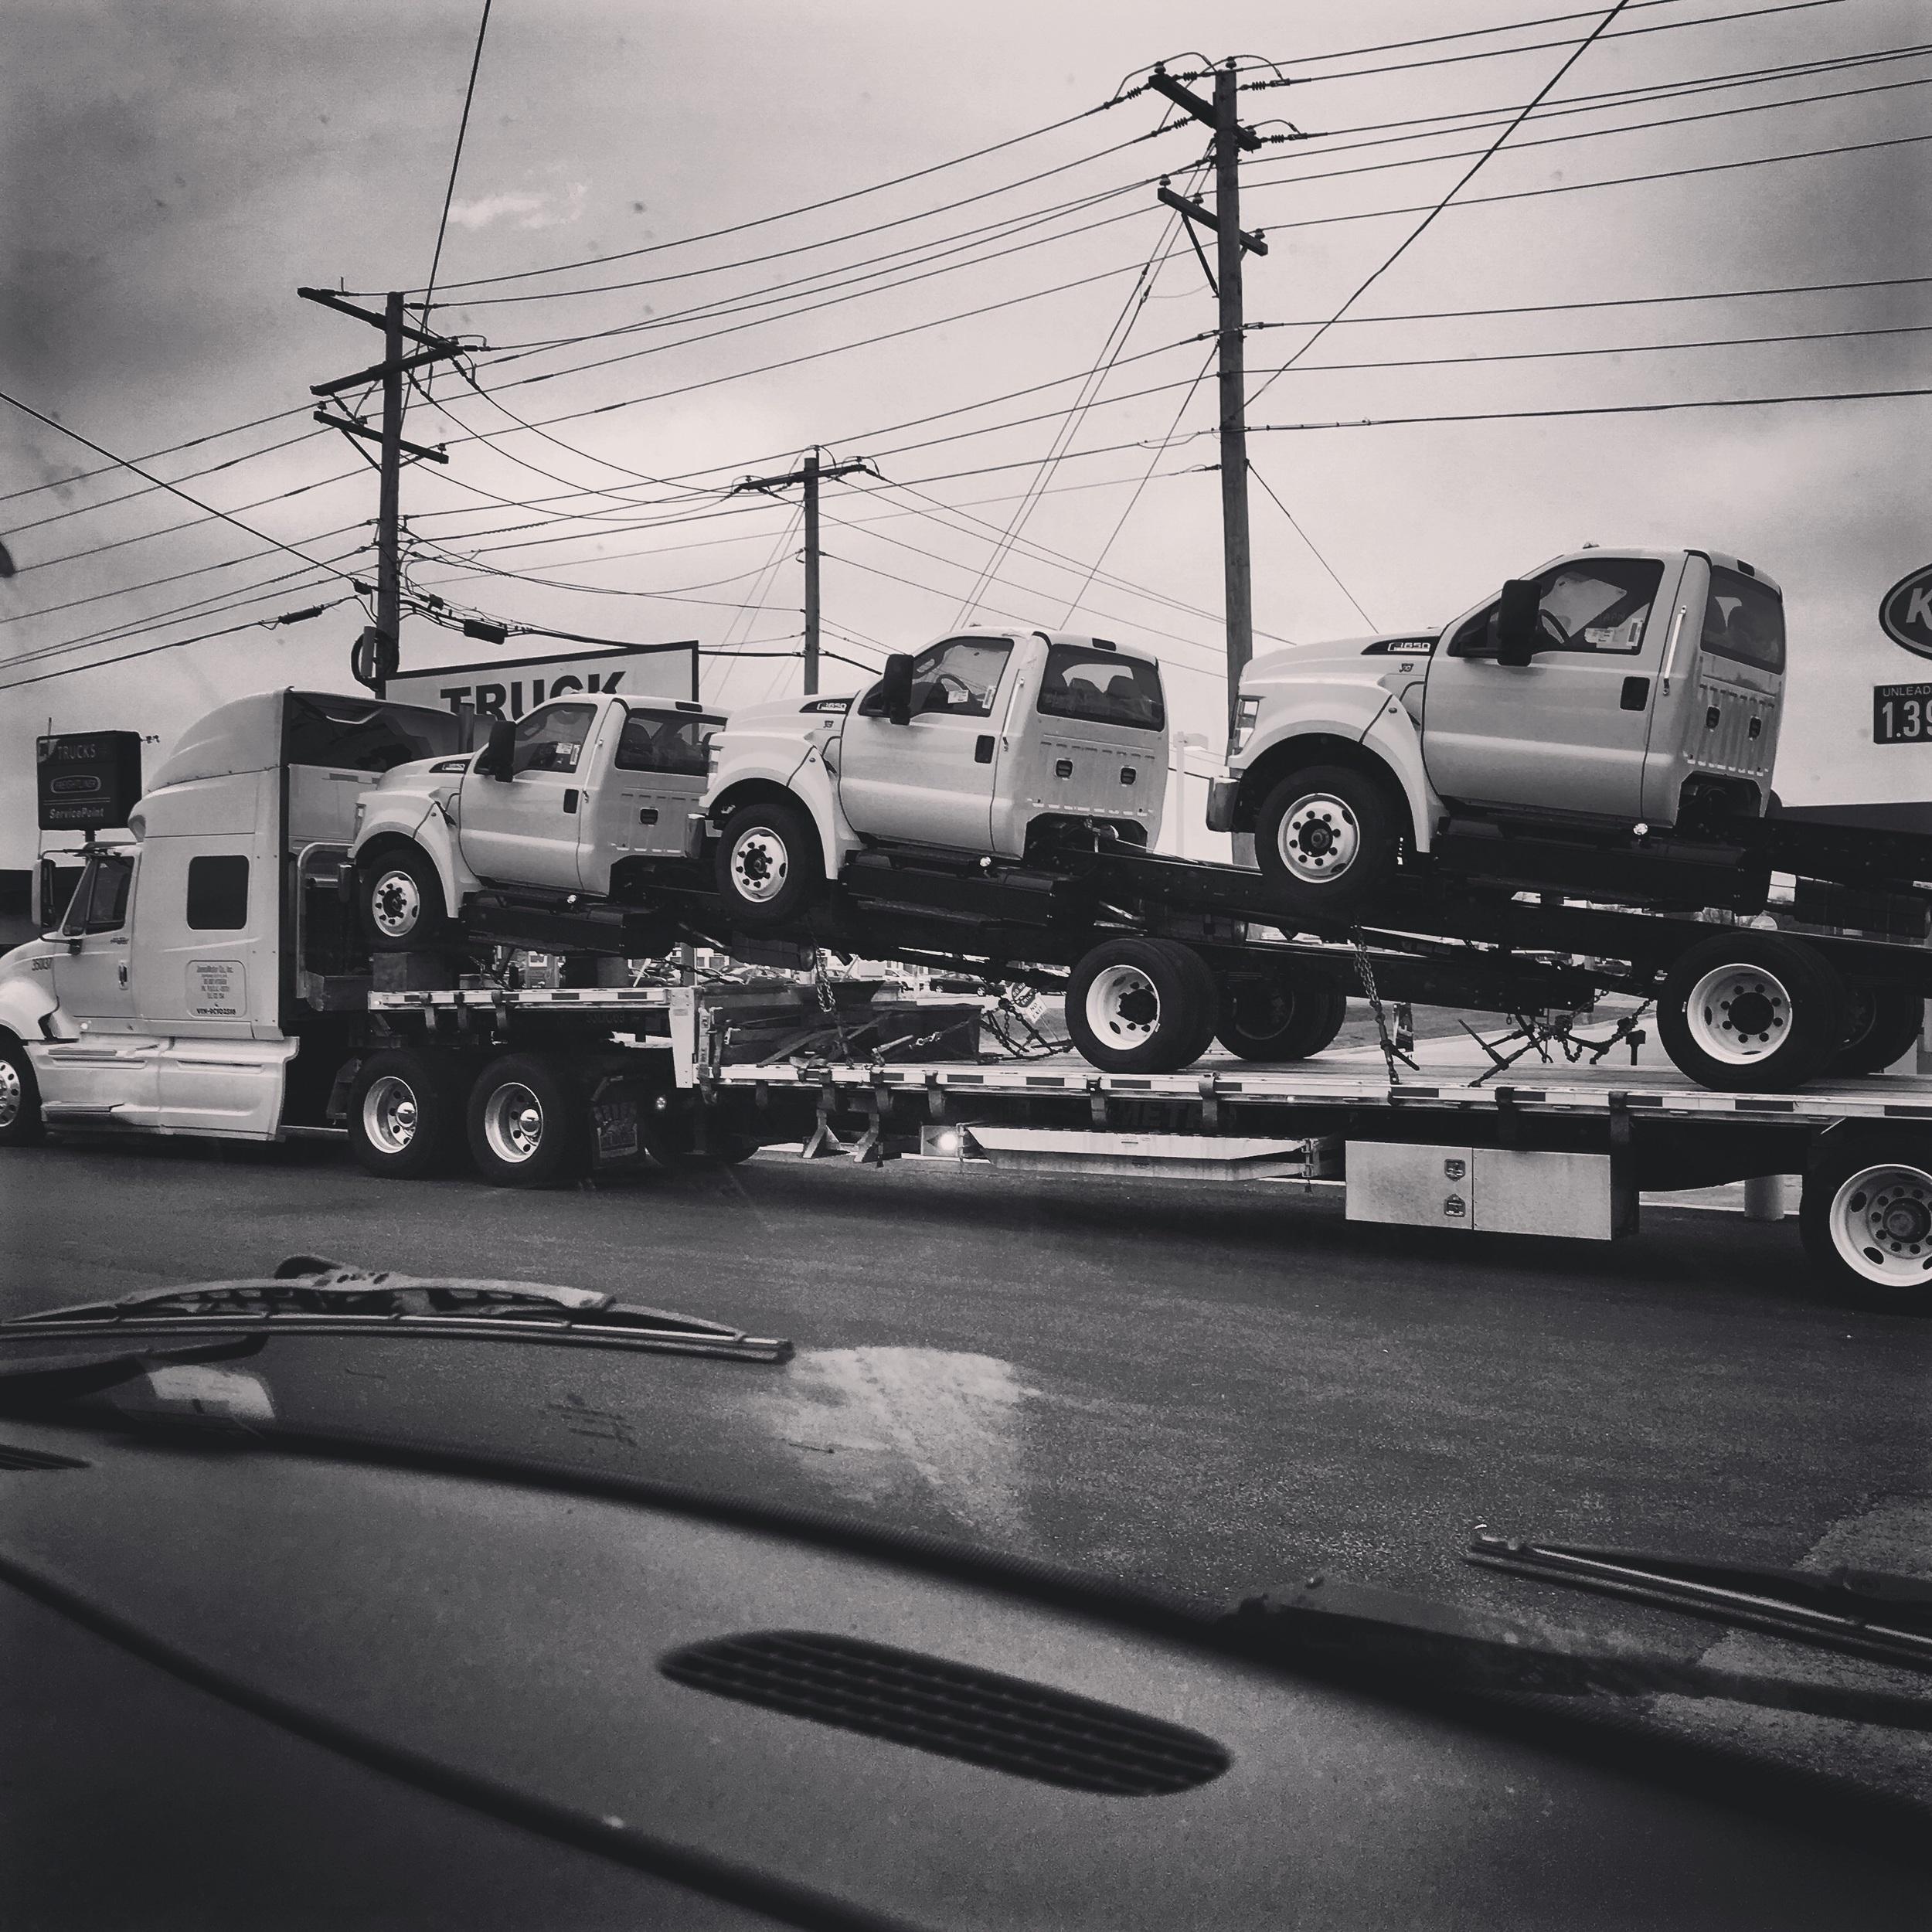 Trucks on top of trucks...